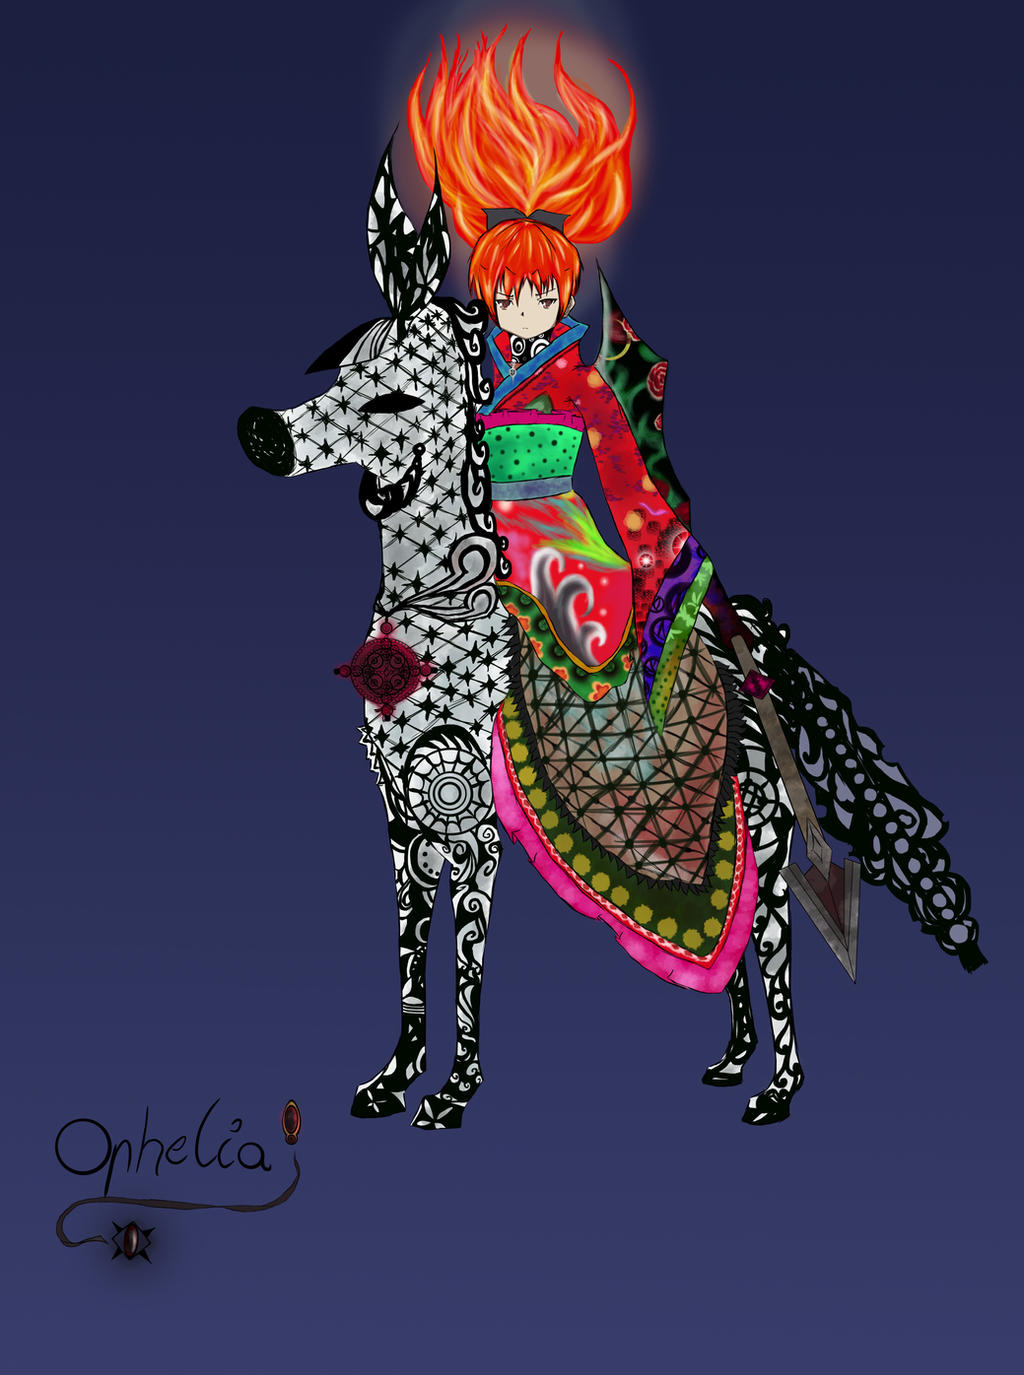 Ophelia by moonwind22 on DeviantArt